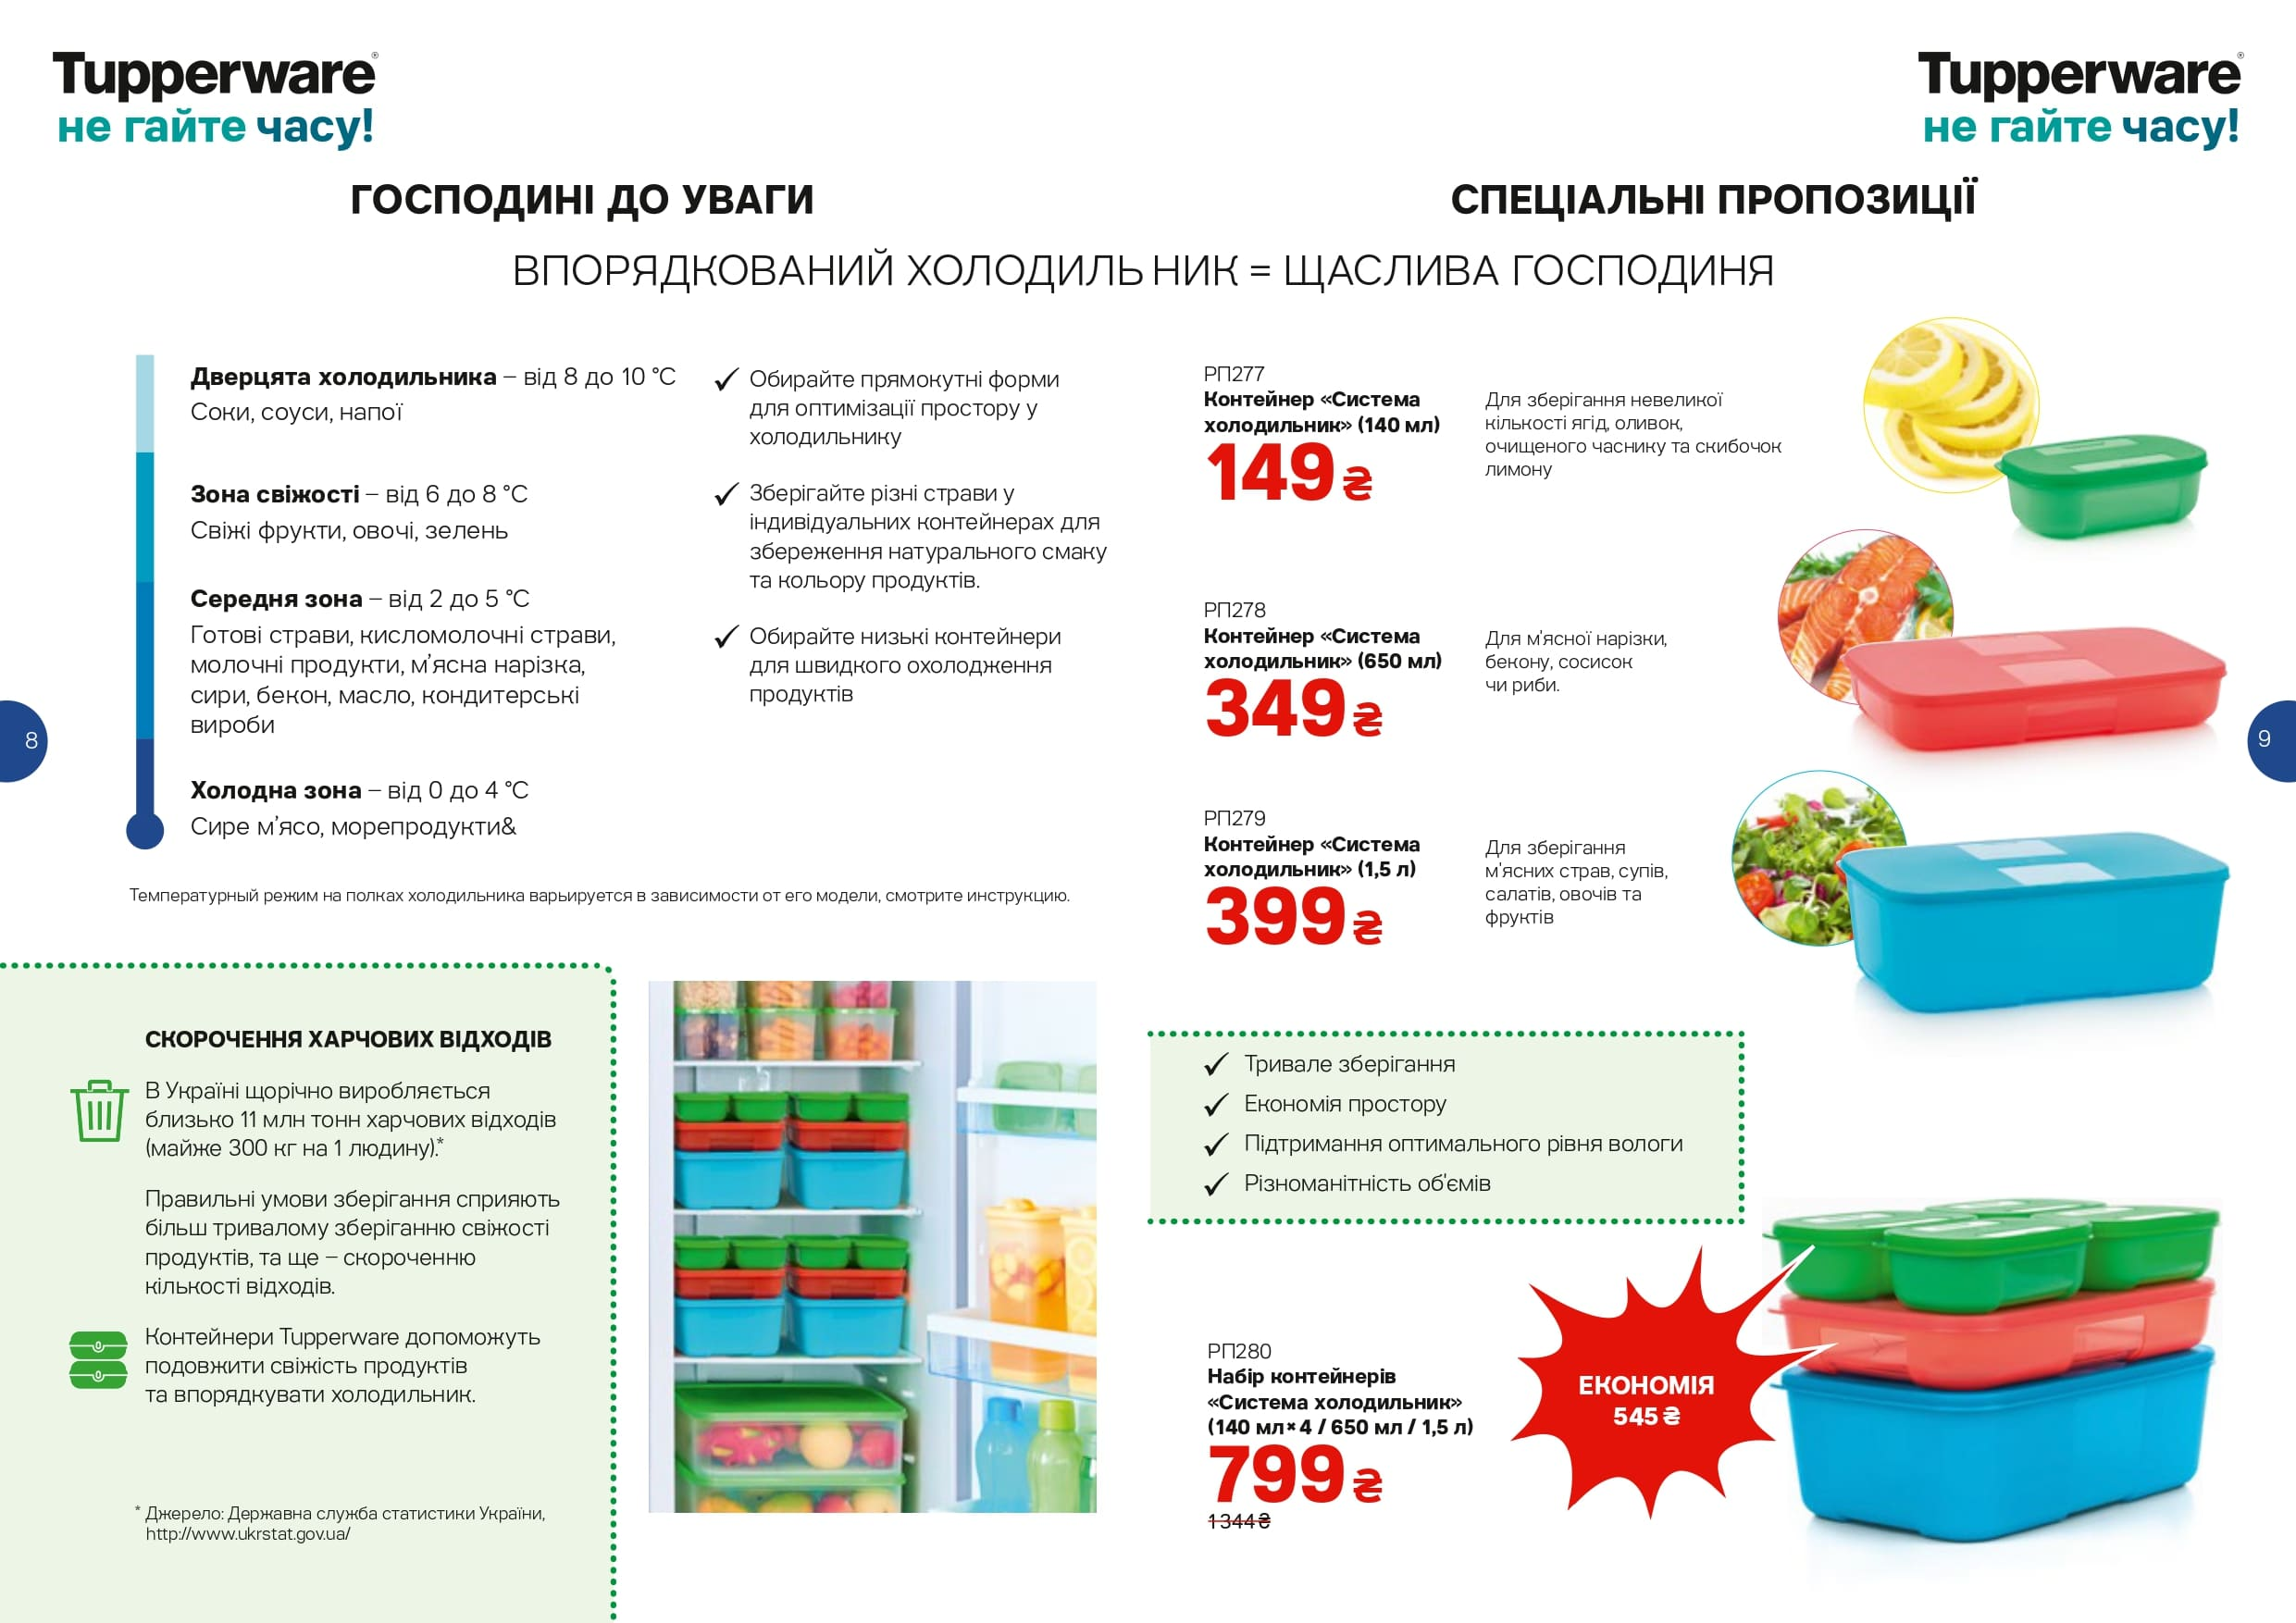 Система холодильник от Tupperware поможет вам навести порядок в вашем холодильнике